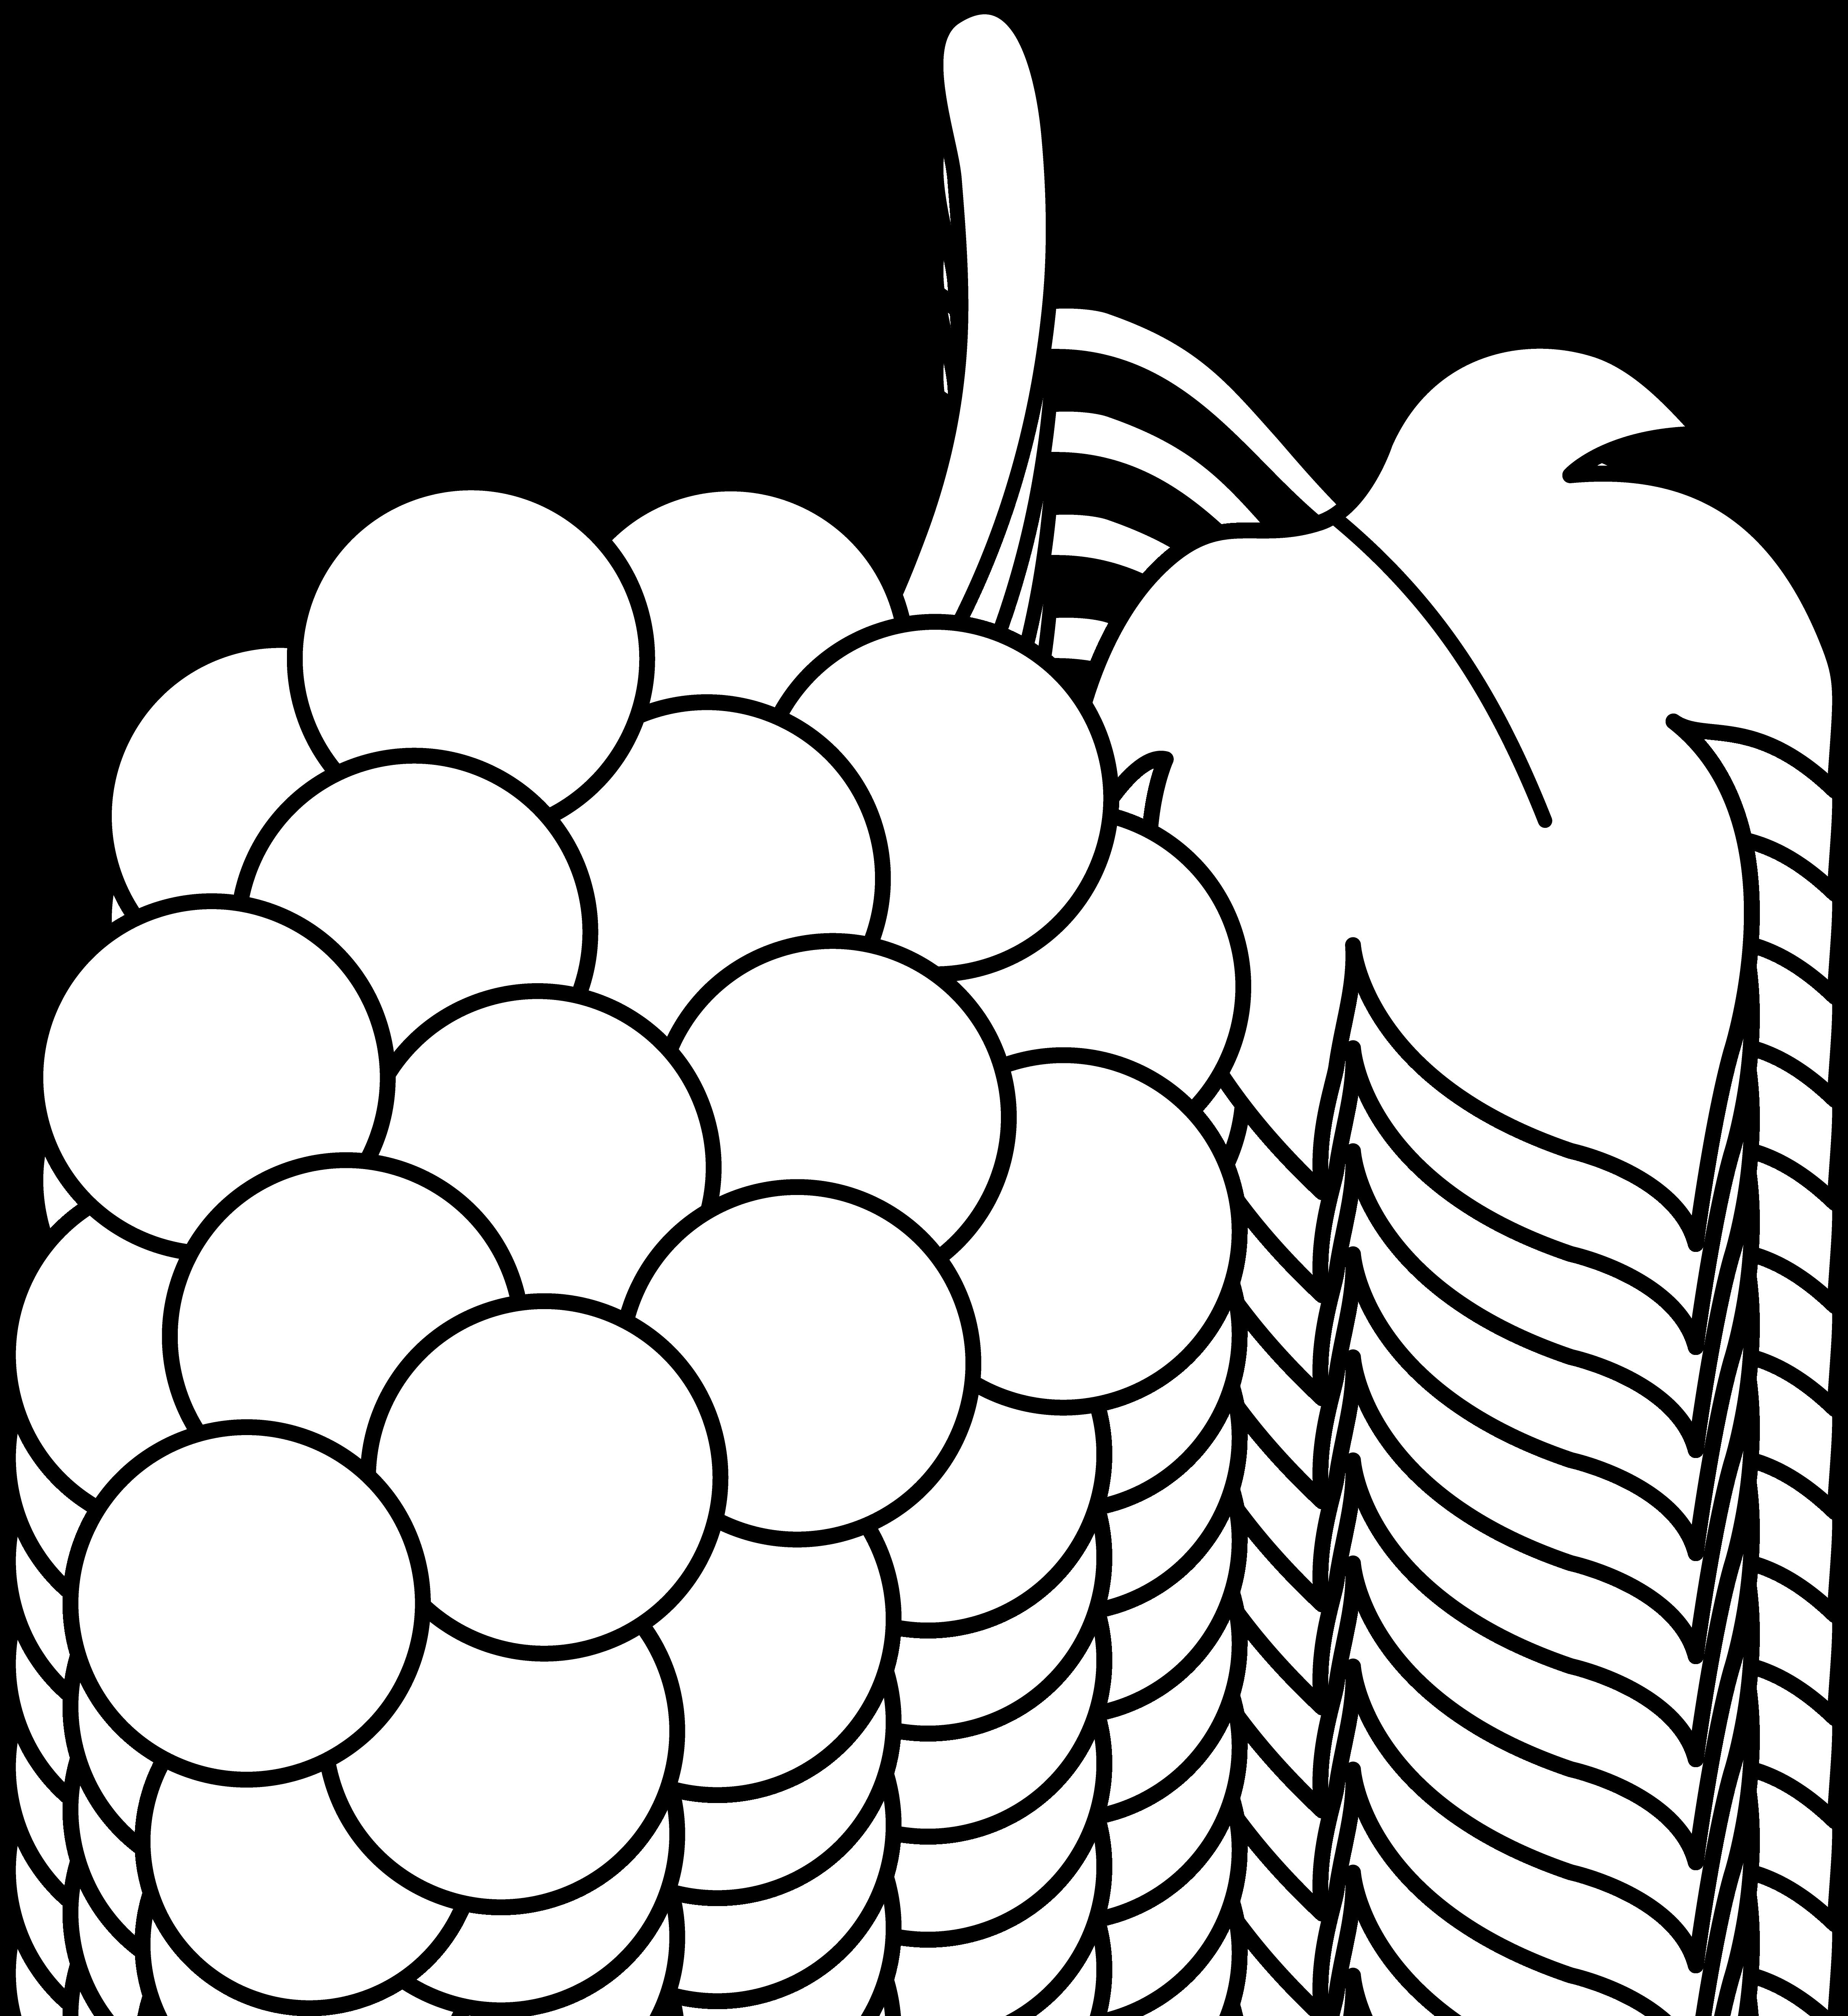 jpg Grapes clipart outline. Line art of a